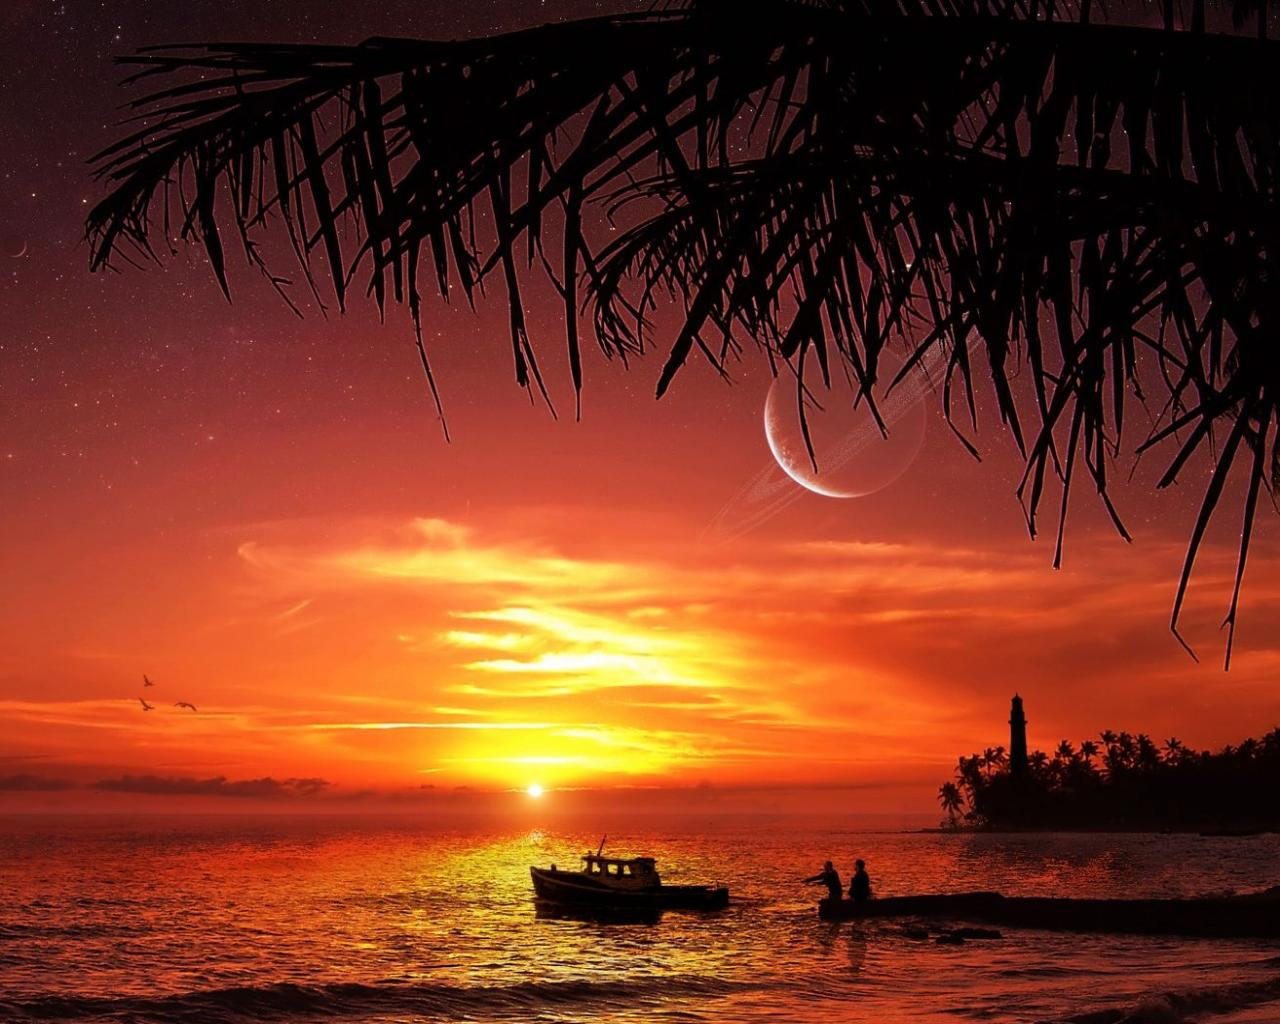 Закат на берегу океана обои для рабочего стола, картинки ...: http://hq-wallpapers.ru/wallpapers/nature/pic18644_raz1280x1024